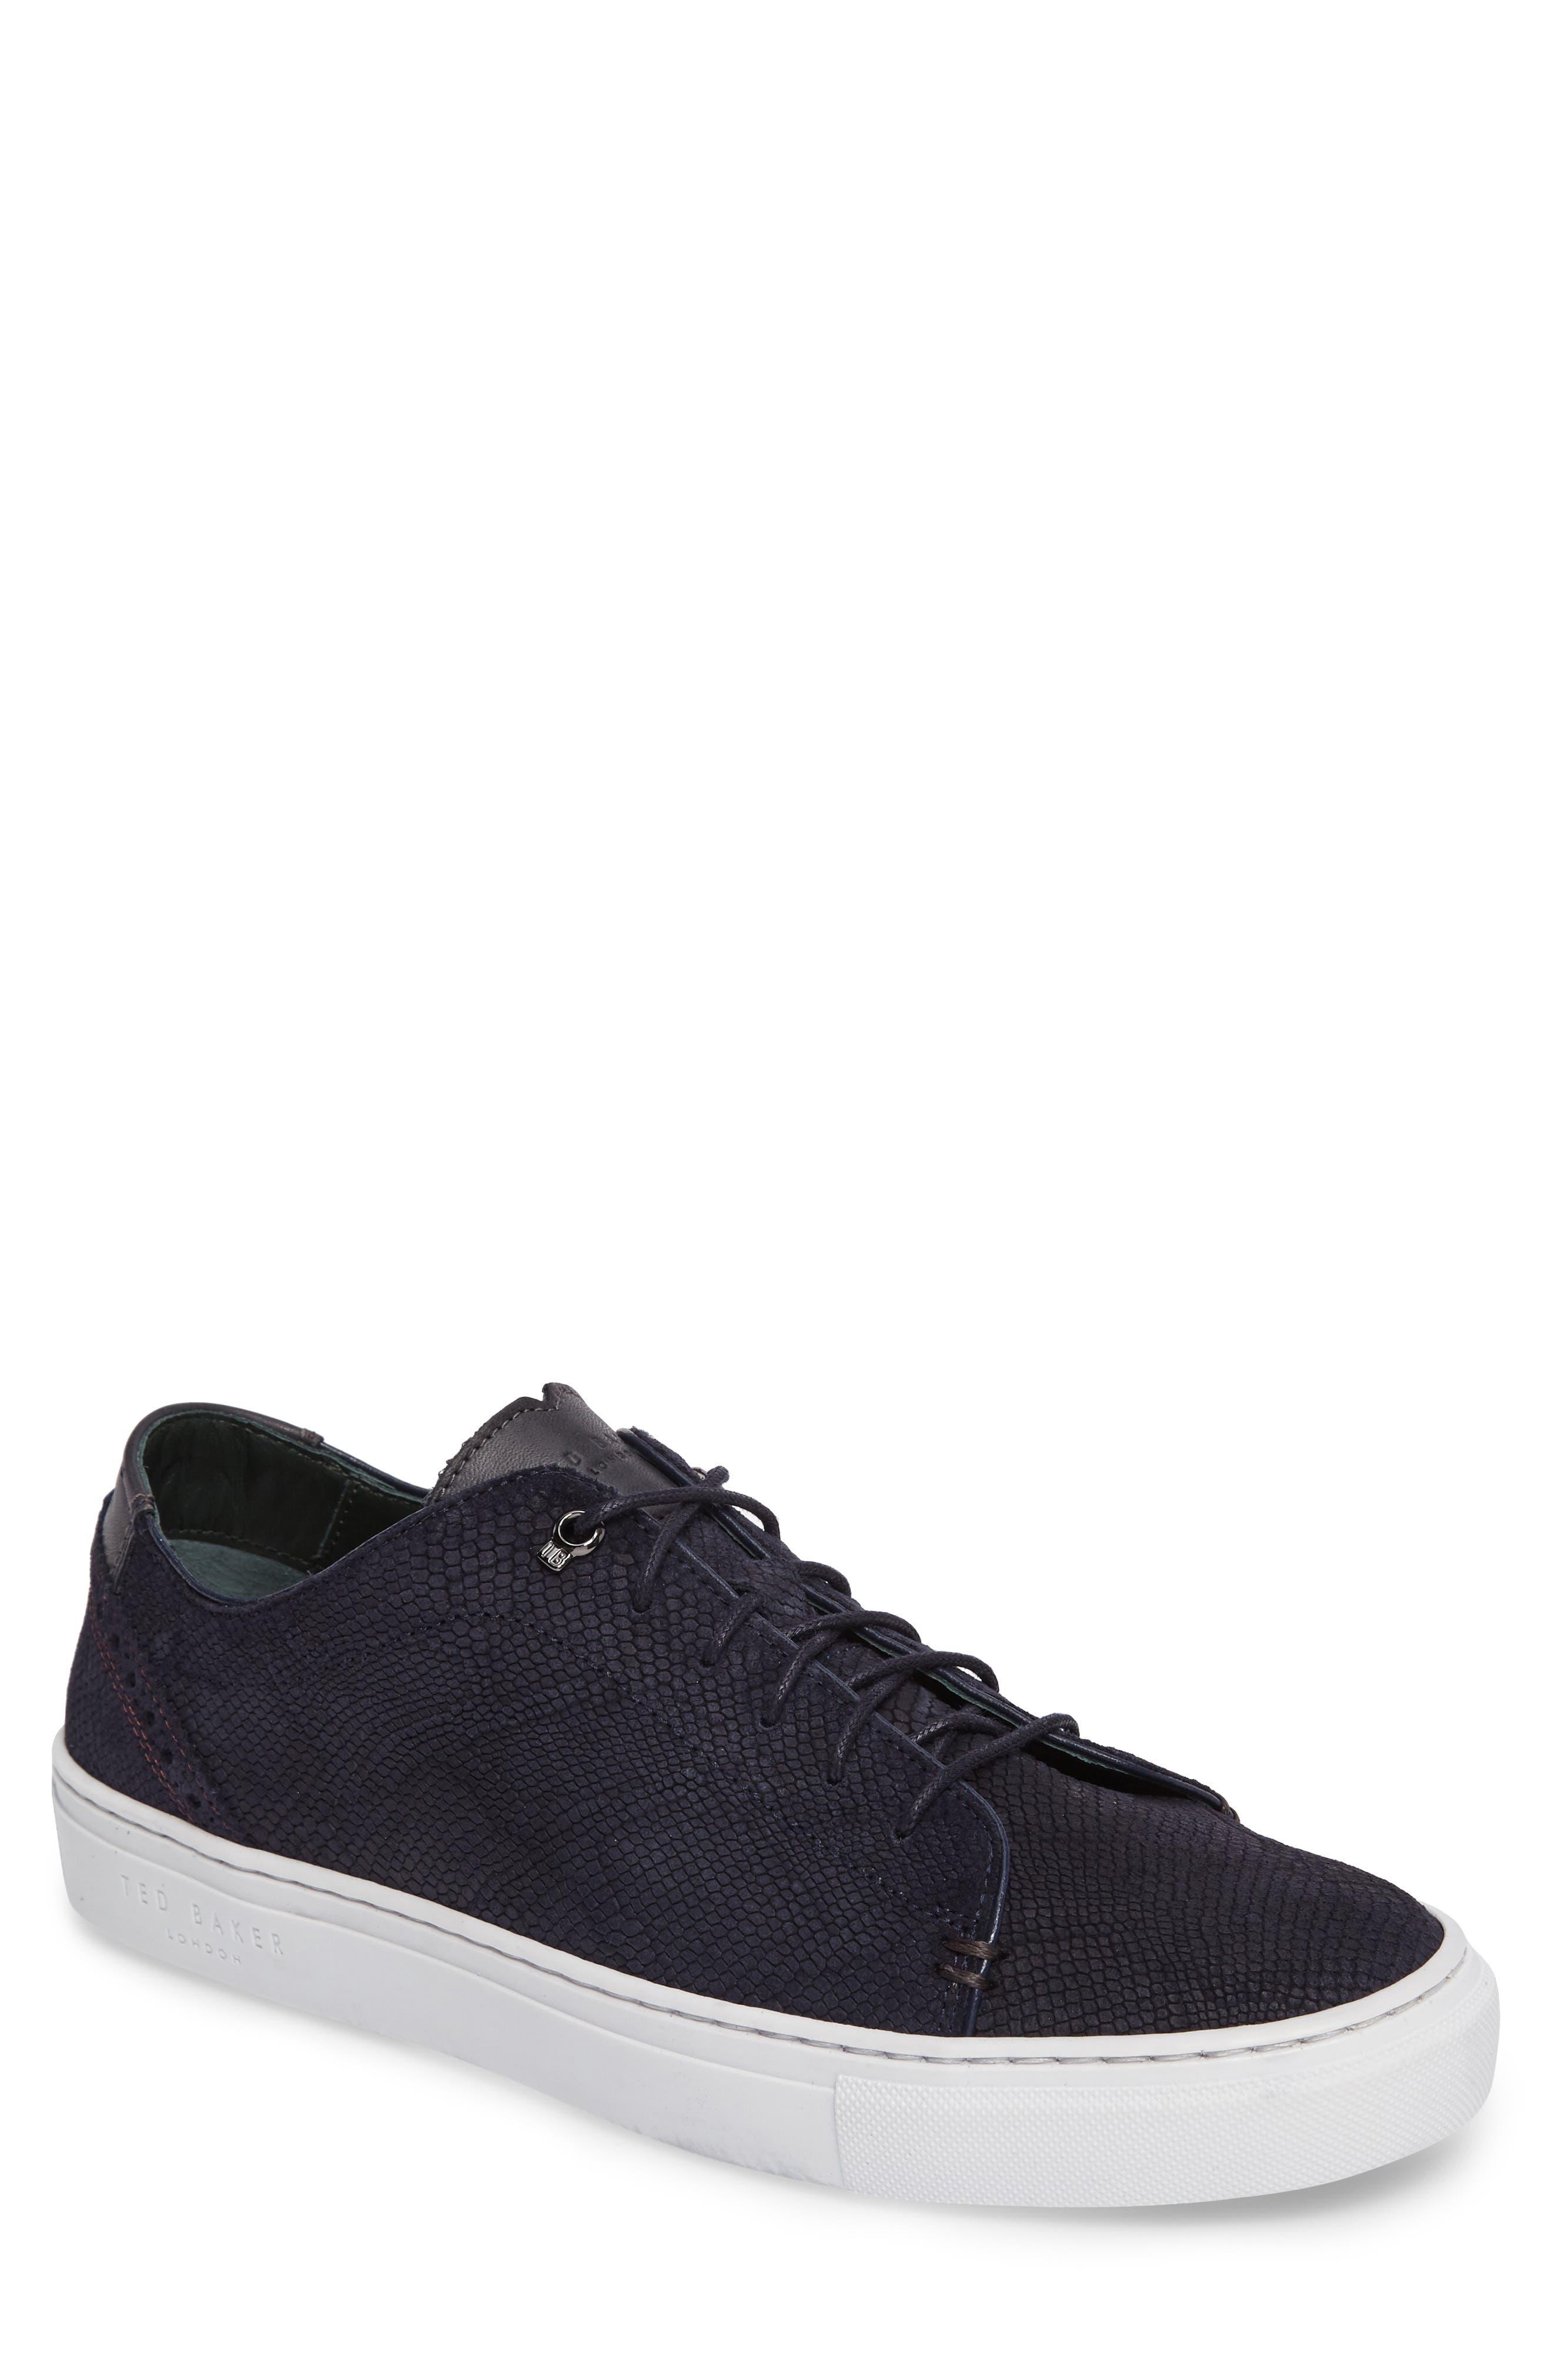 Duuke Sneaker,                         Main,                         color, Dark Blue Suede